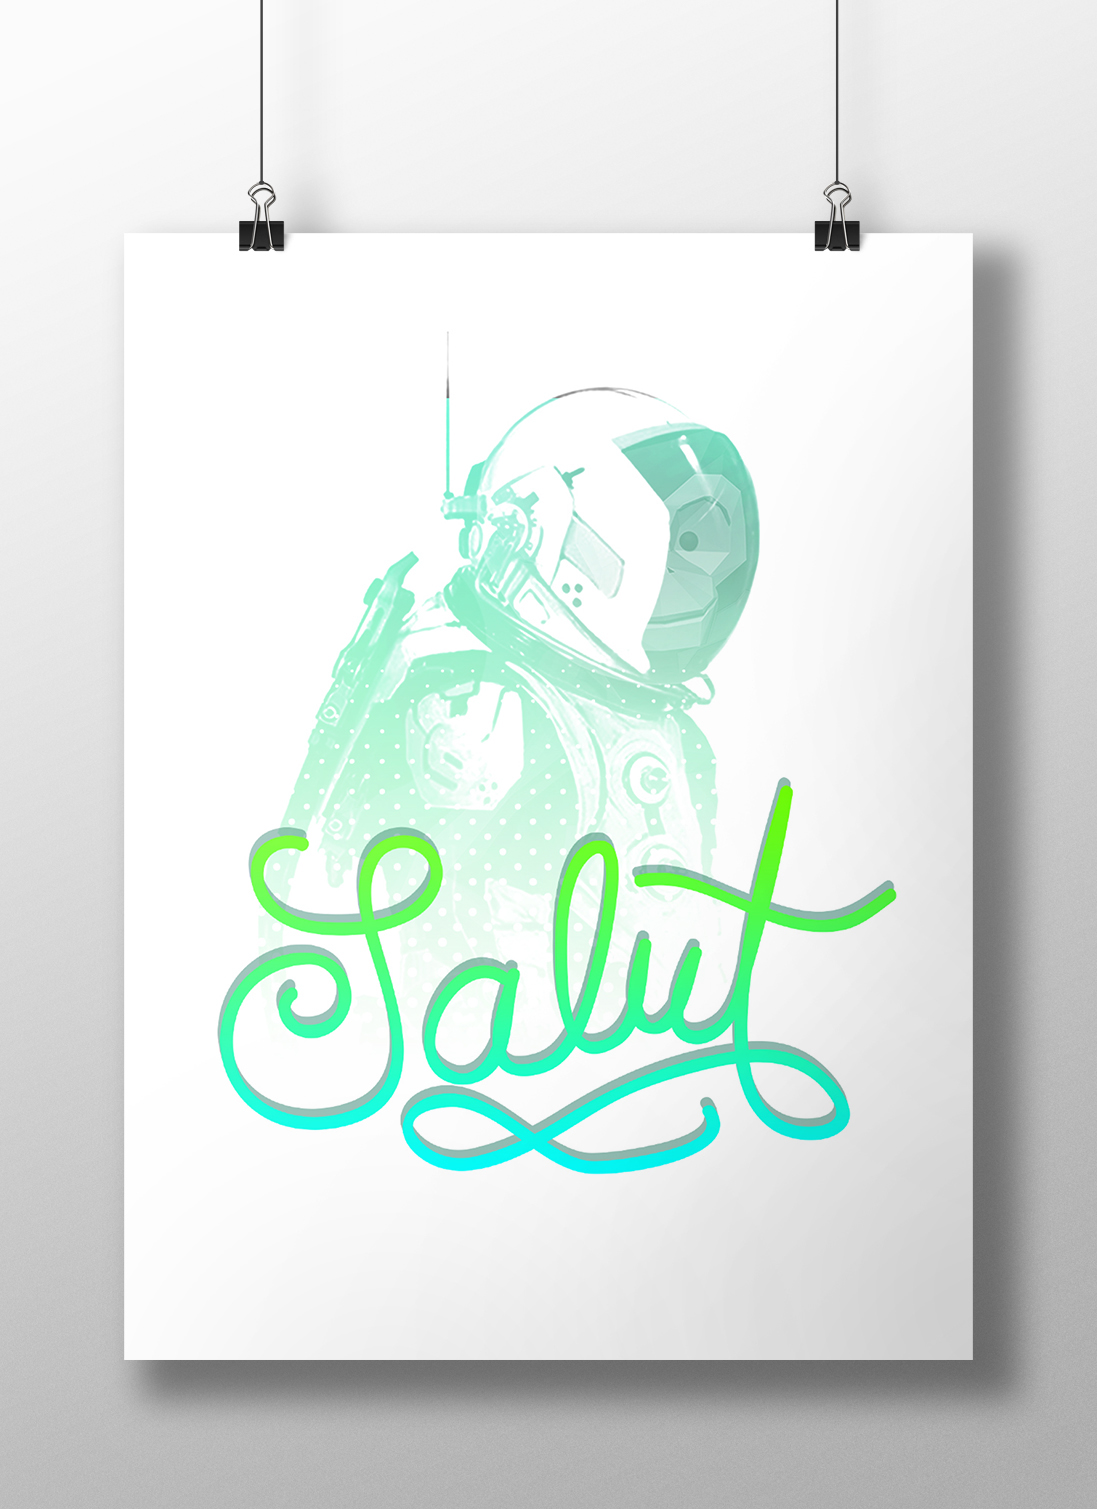 creativejam creativecloud photoshop Illustrator Austin